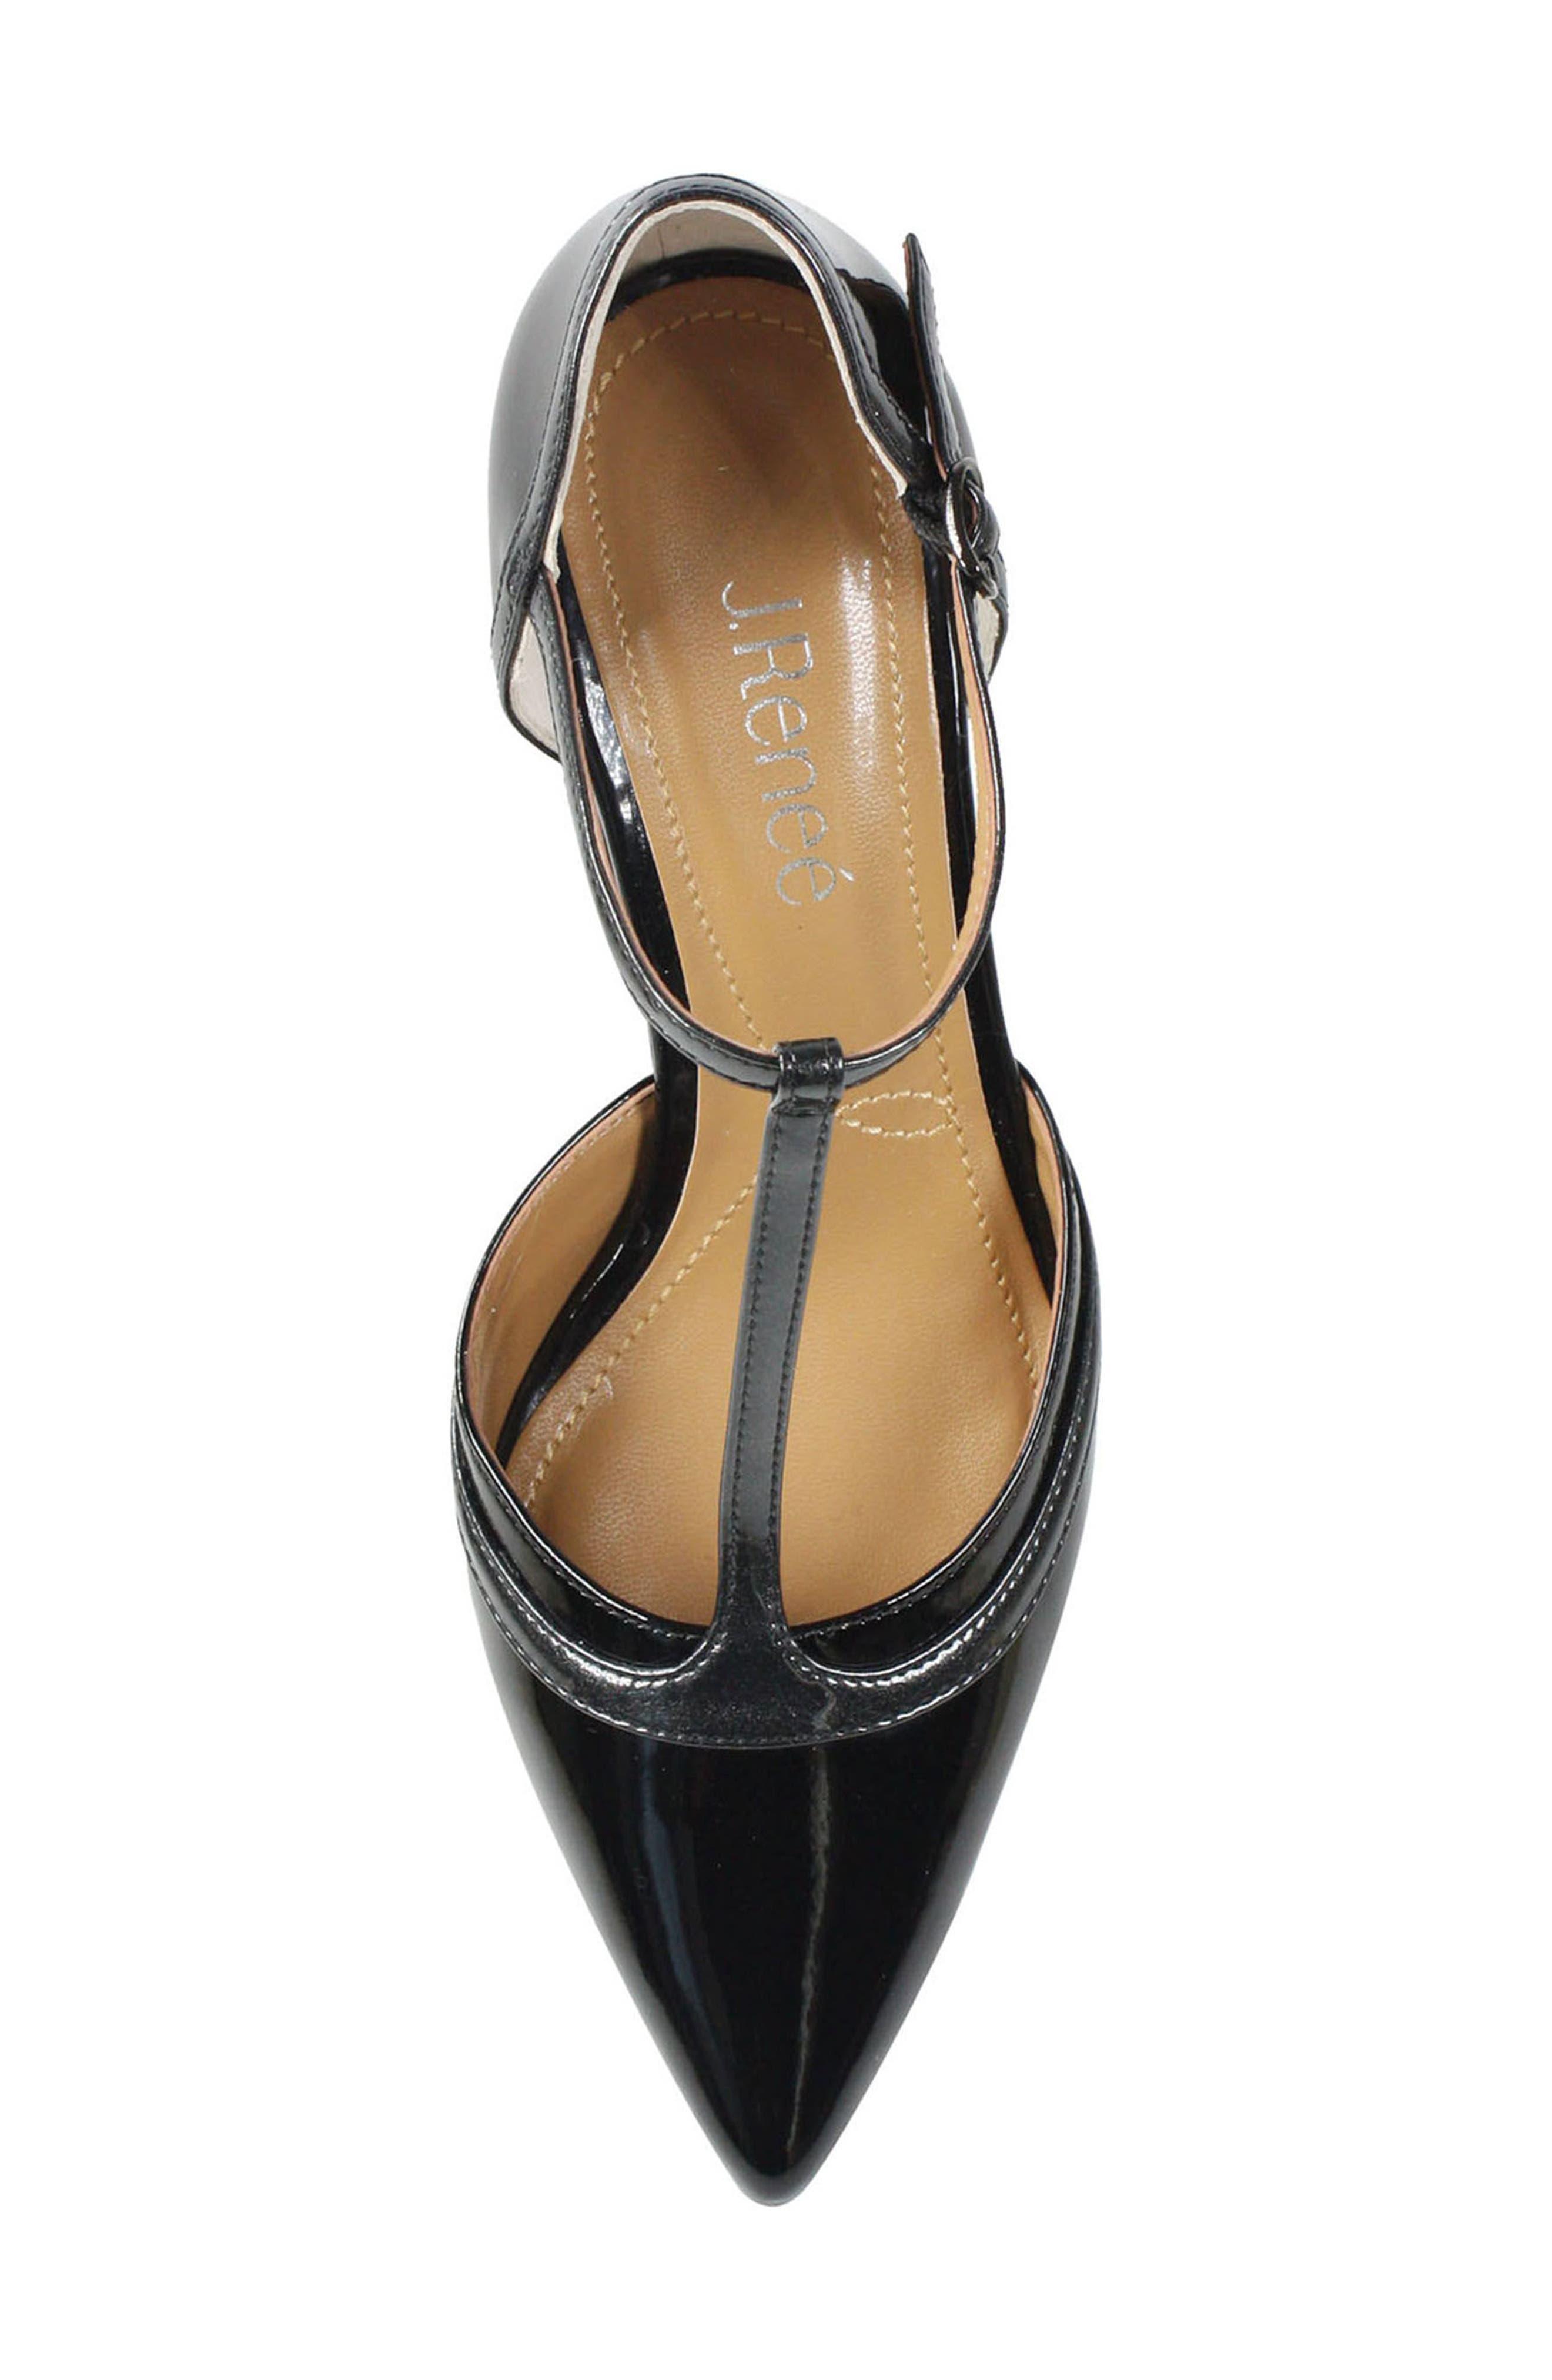 Emiliana T-Strap Pump,                             Alternate thumbnail 5, color,                             Black/ Pewter Patent Leather